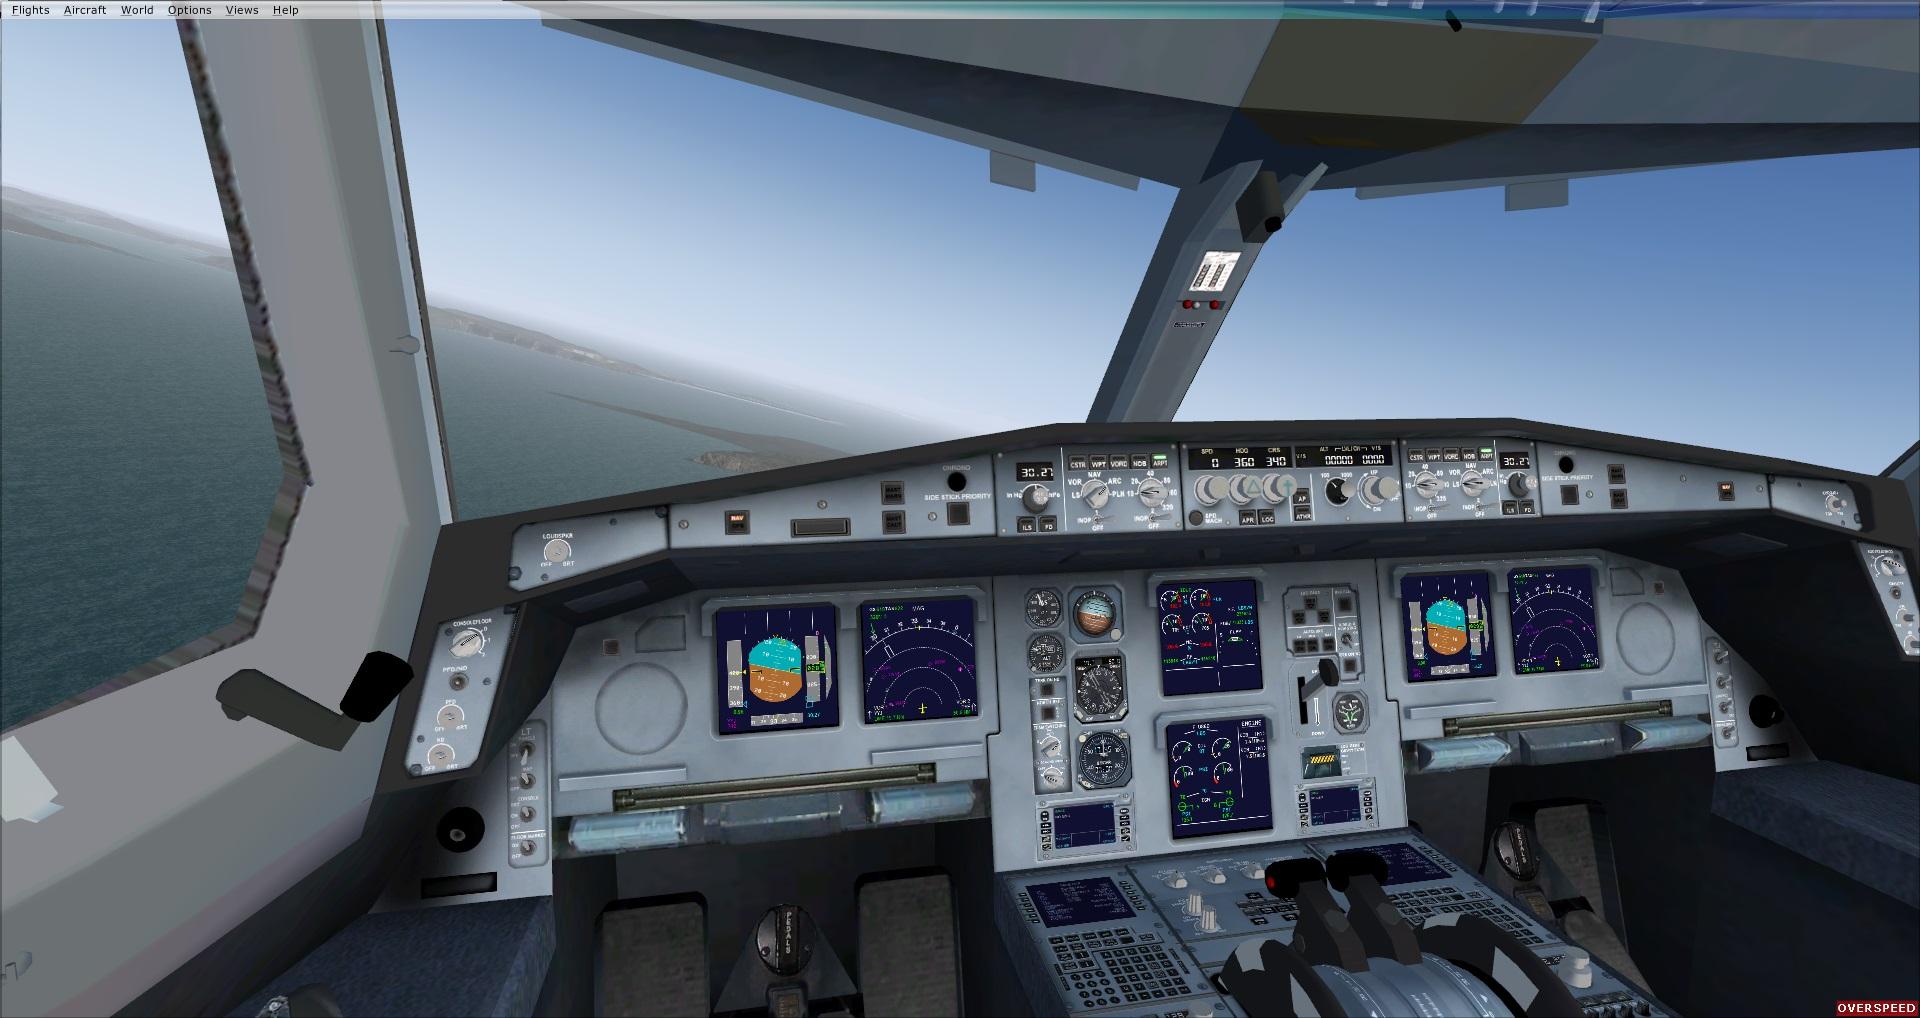 fs-freeware net - FSX Airbus A350-900XWB with VC